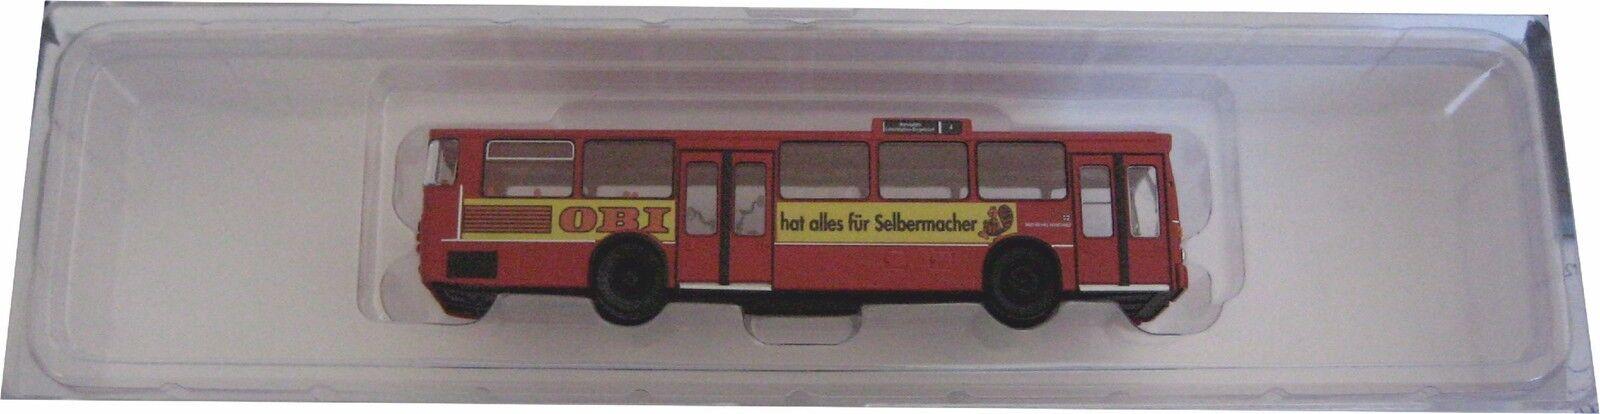 Brekina 50747 MB O 305 Stadt-Linienbus (VÖV) (VÖV) (VÖV) Stadtwerke Konstanz - OBI 1 87 HO 2ce42d